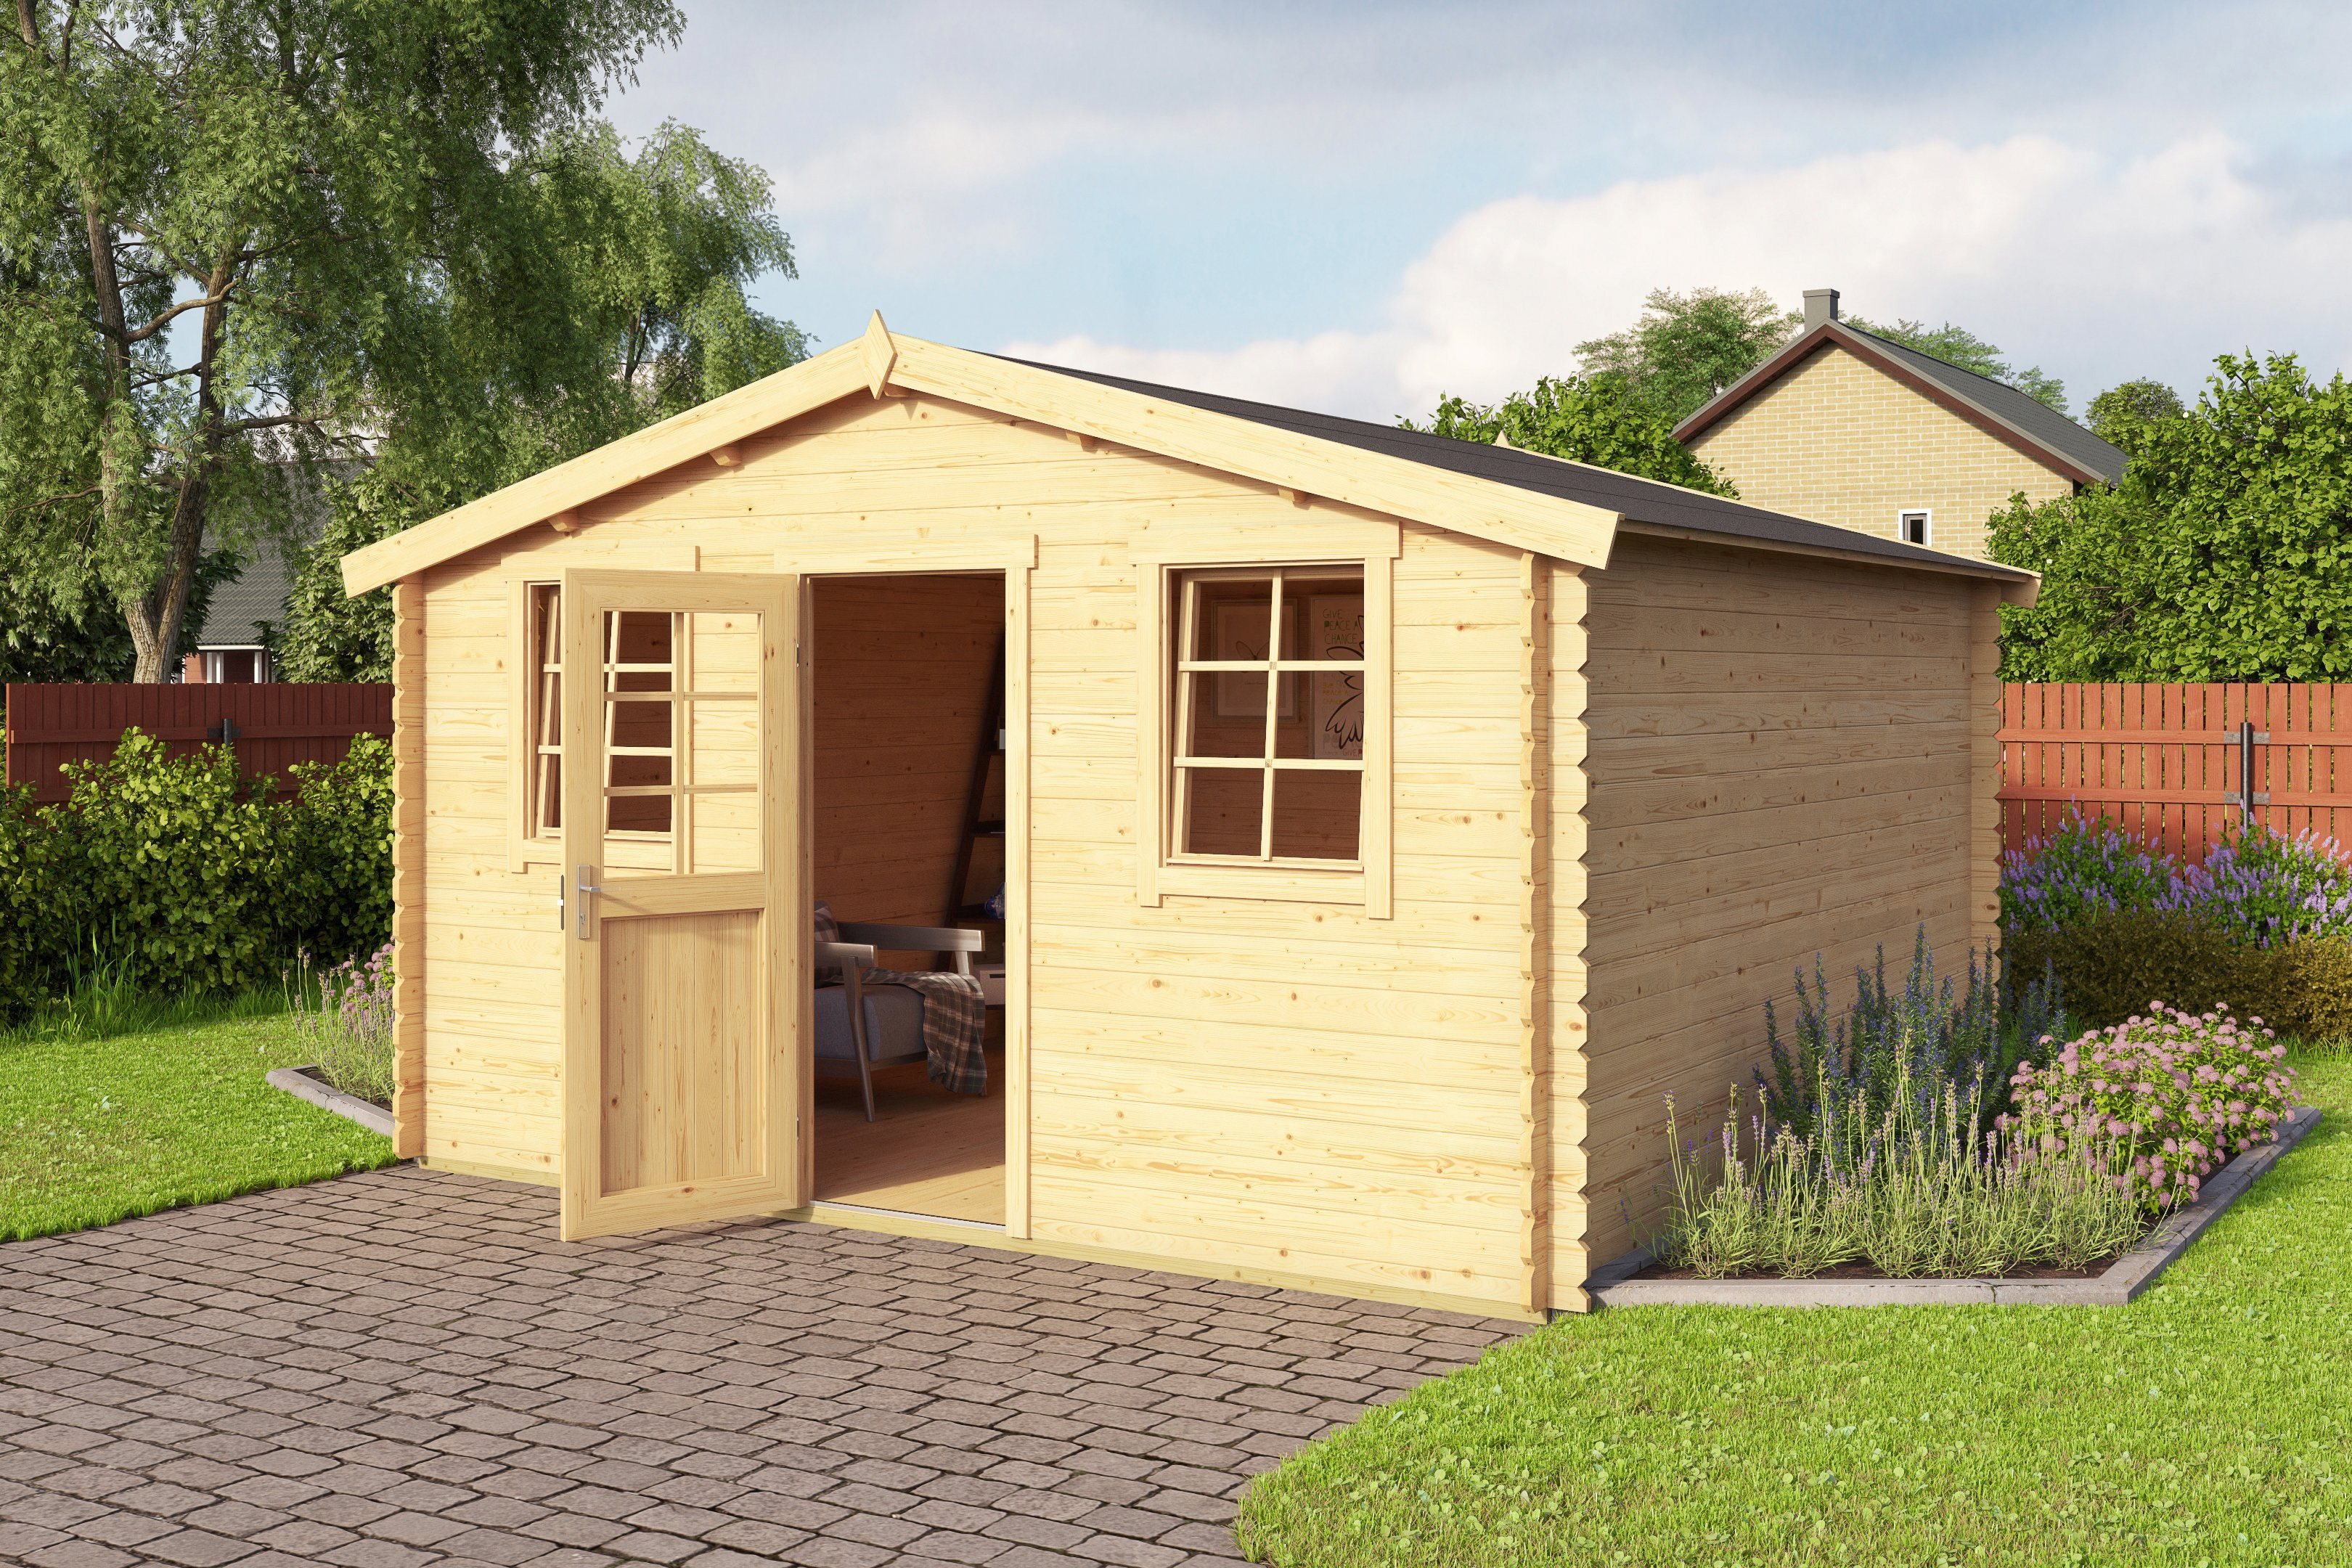 OUTDOOR LIFE PRODUCTS Gartenhaus »Mosel 4 ET«, BxT: 410x410 cm, 28 mm | Garten > Gartenhäuser | Outdoor Life Products